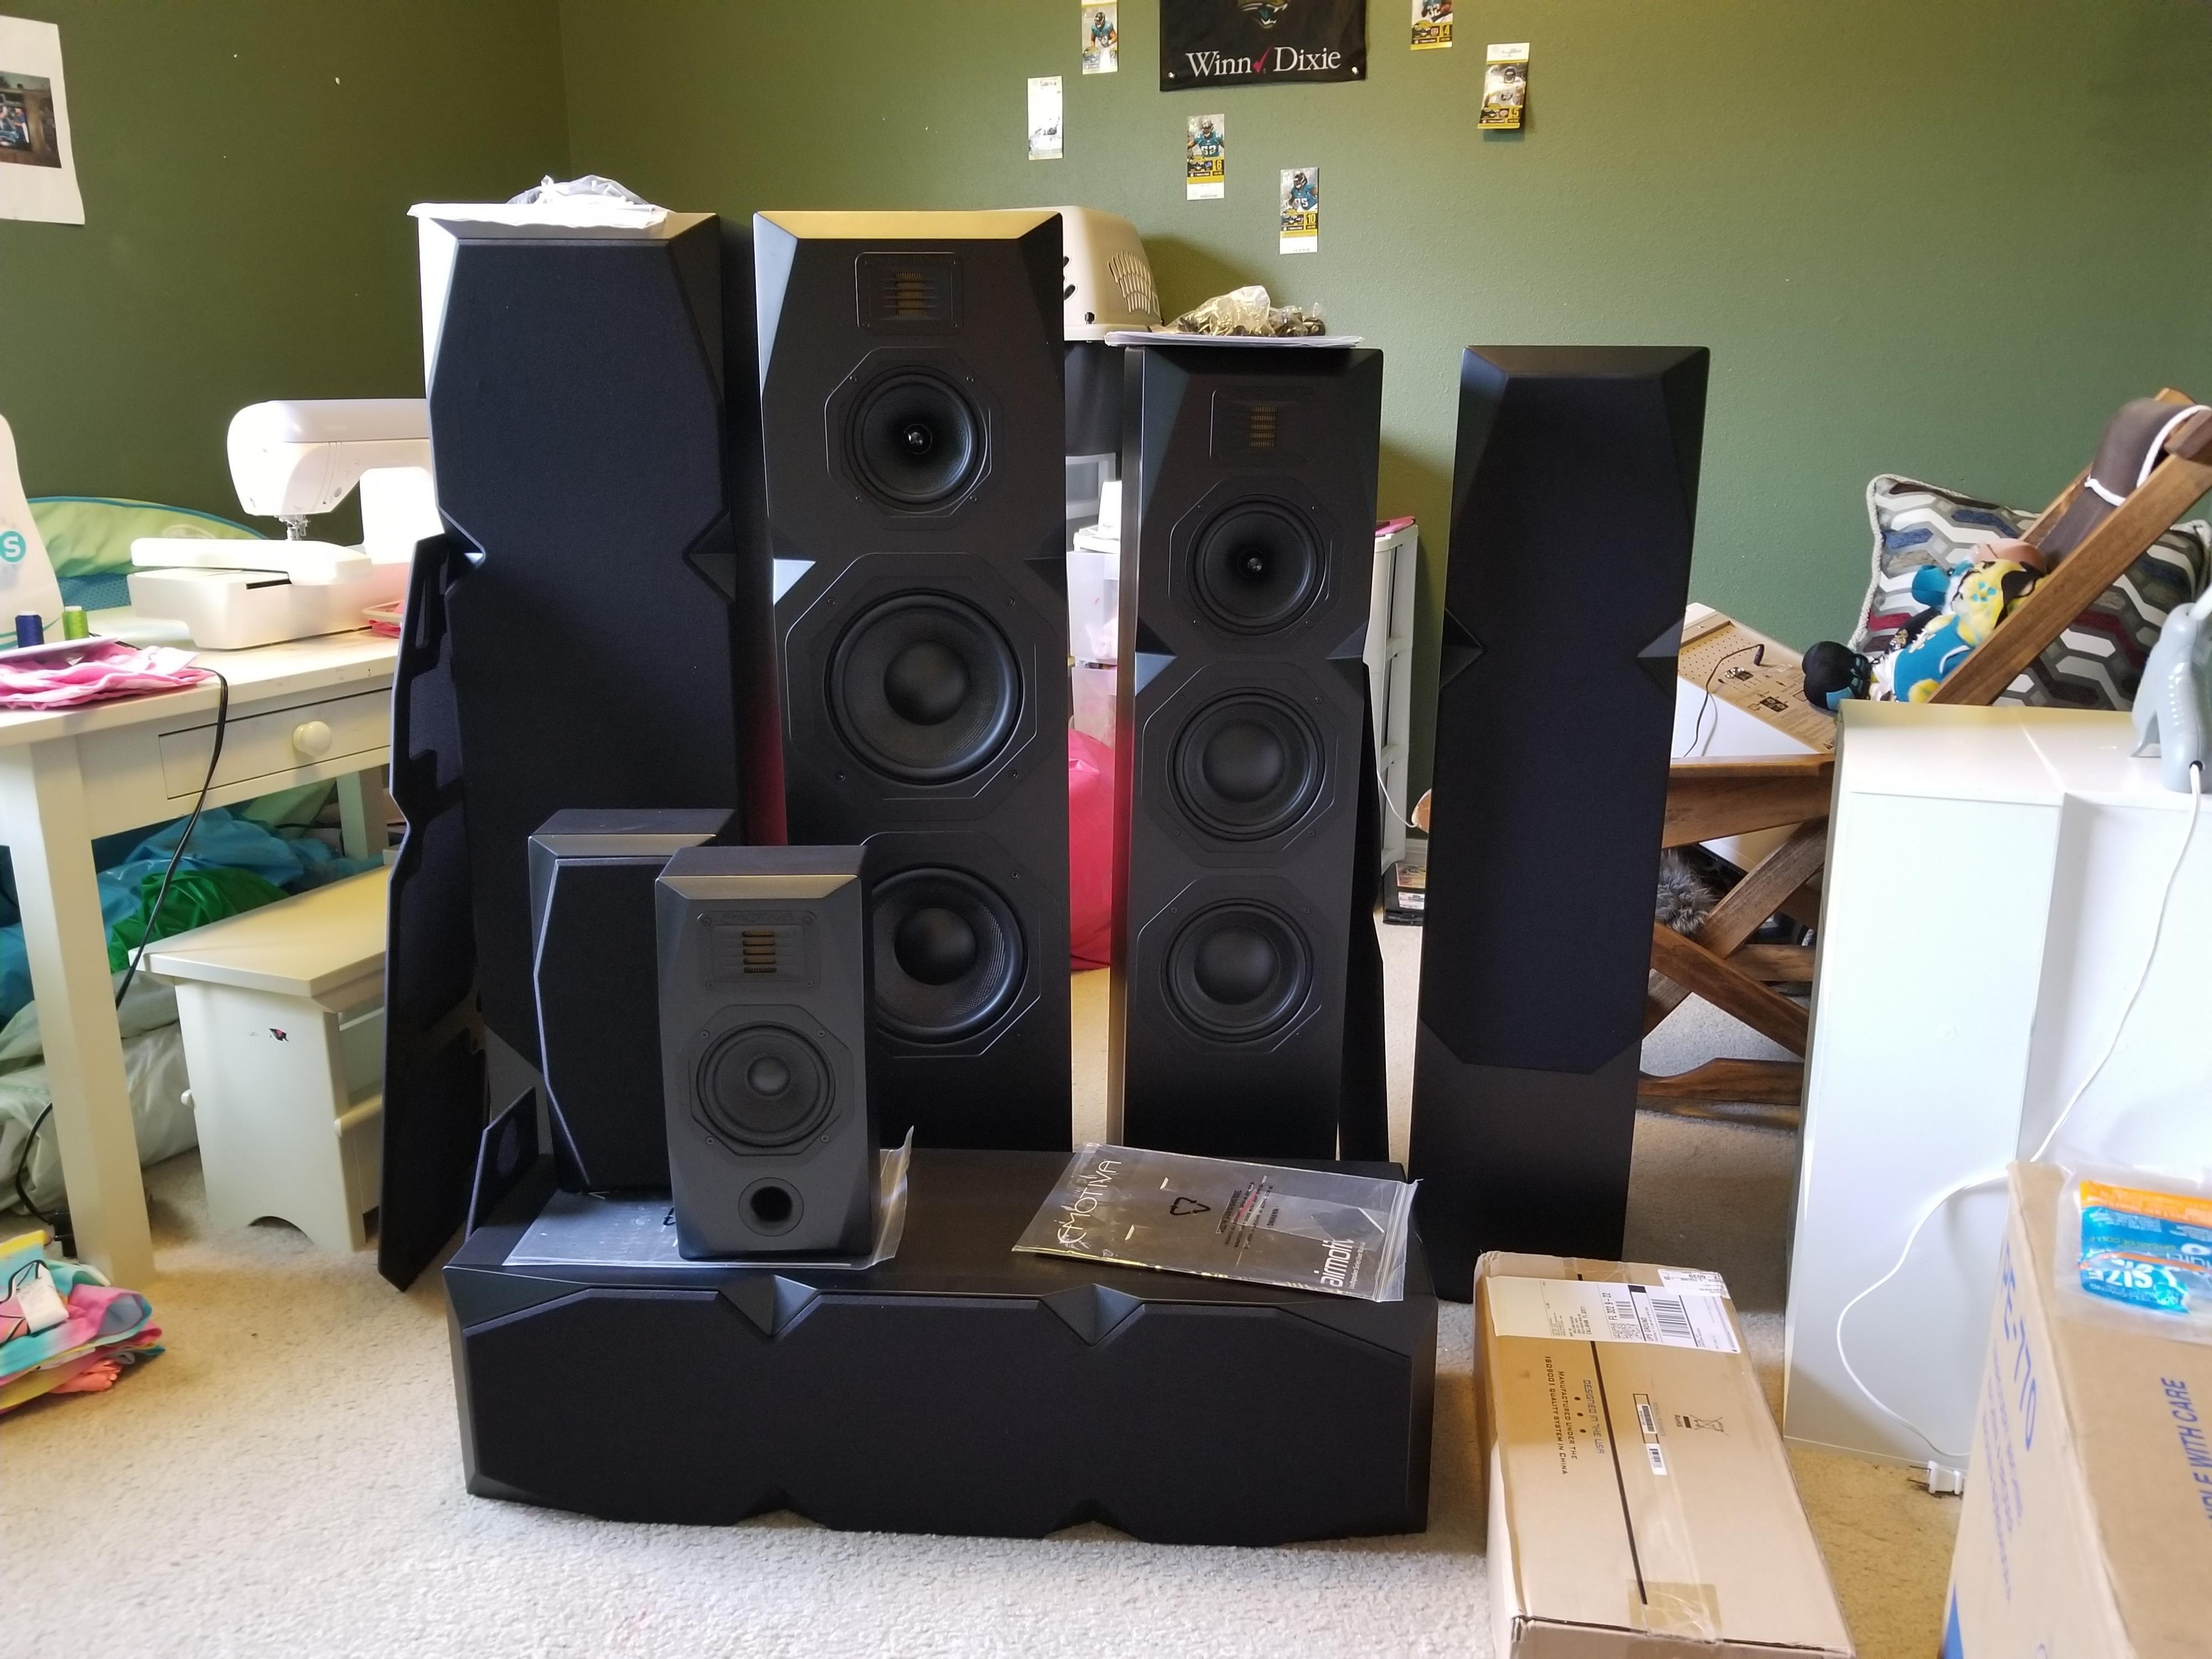 Click image for larger version  Name:airmotiv speakers.jpg Views:25 Size:877.3 KB ID:2567558